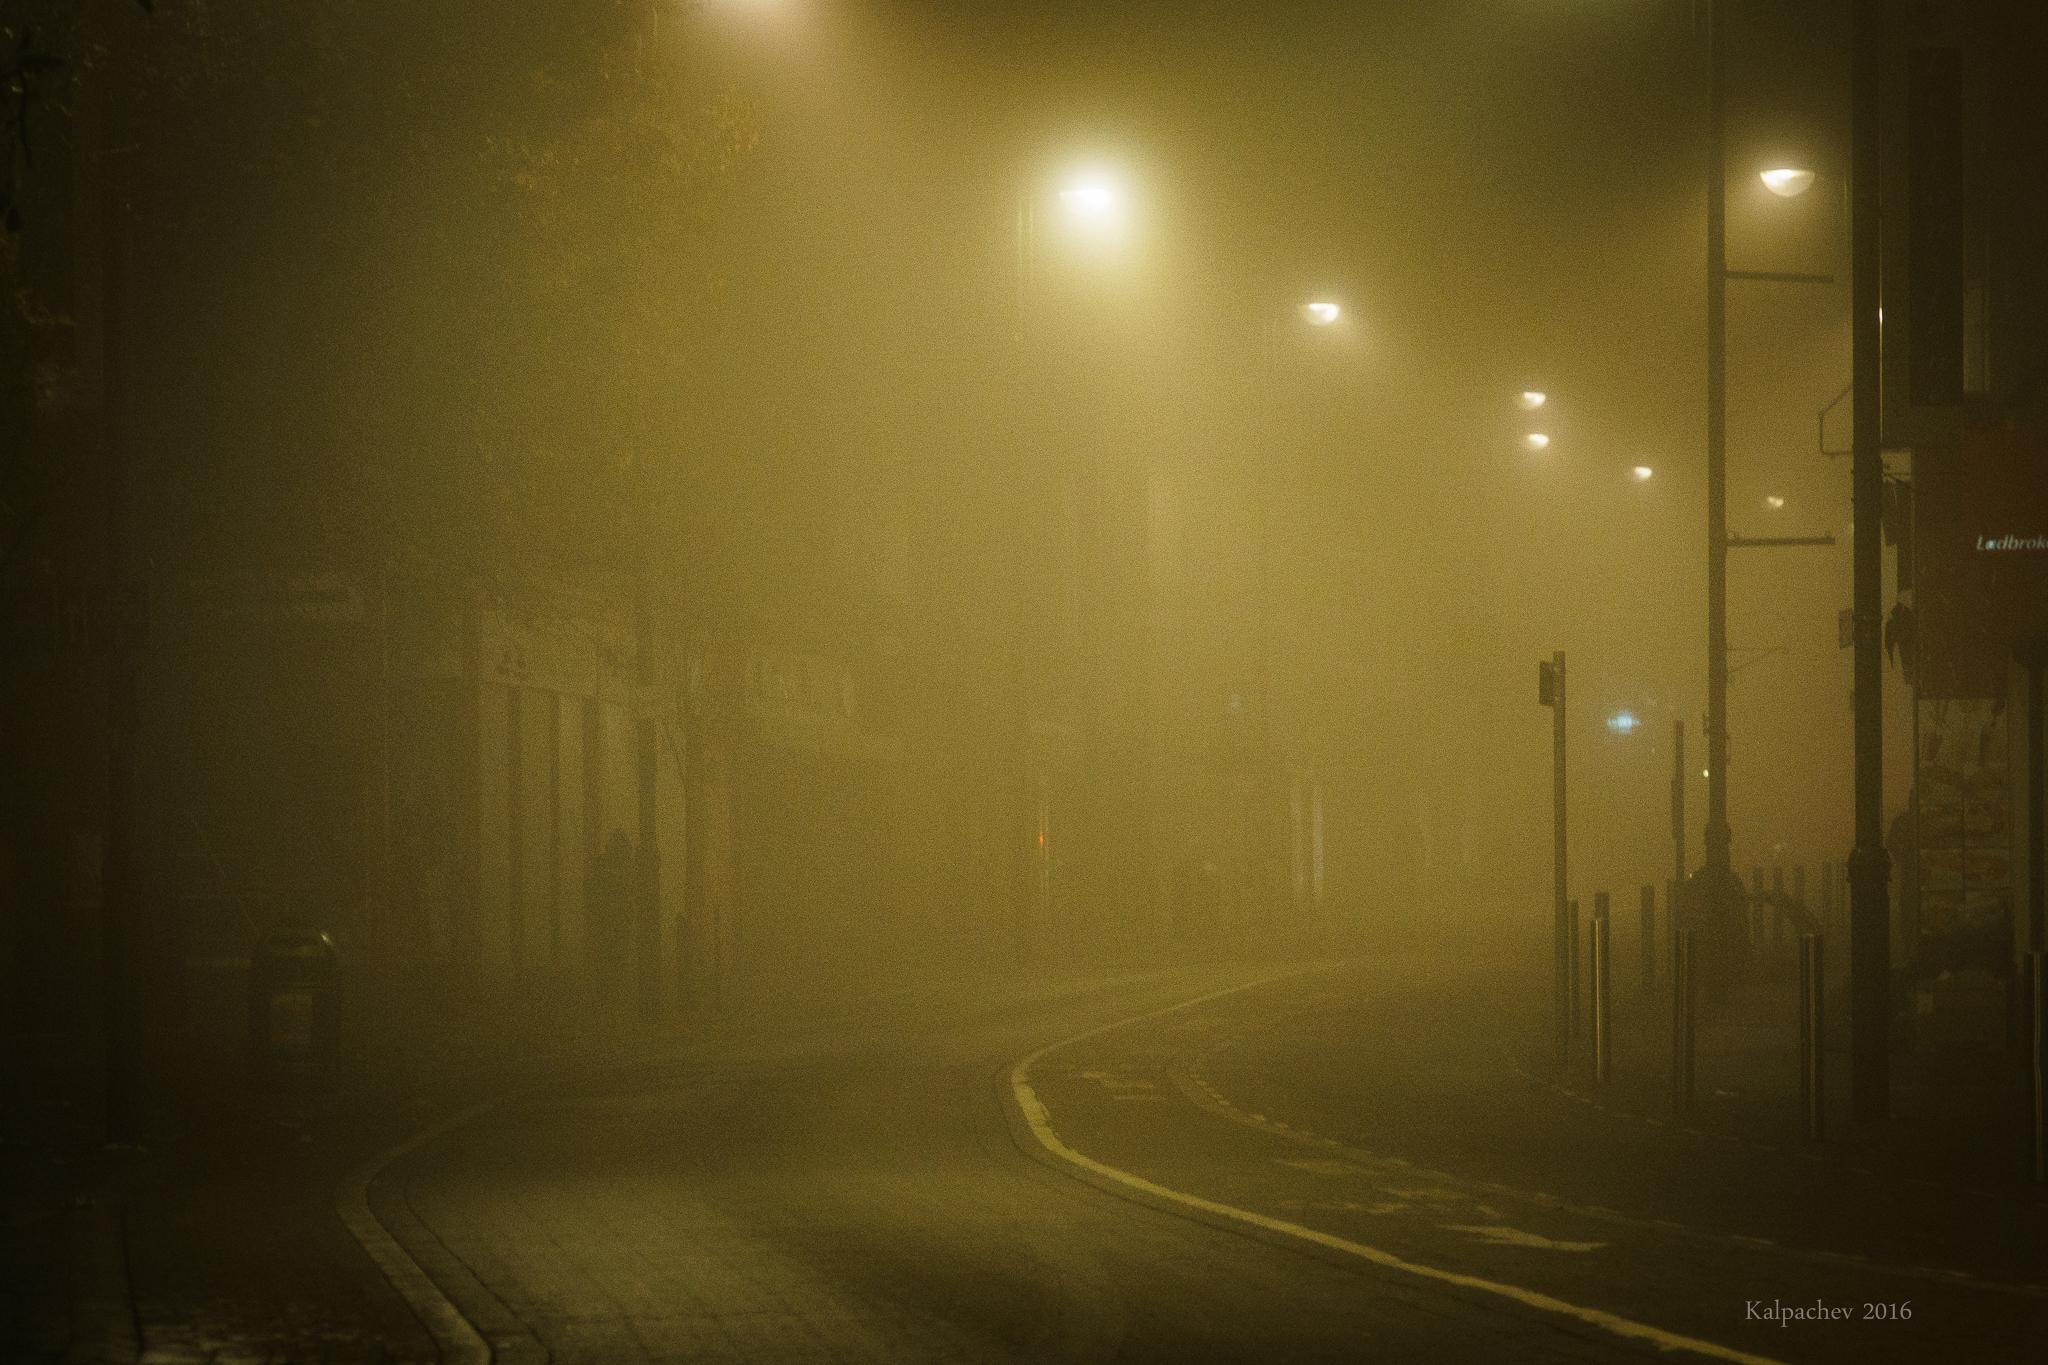 London at its best #london #fog #foggy